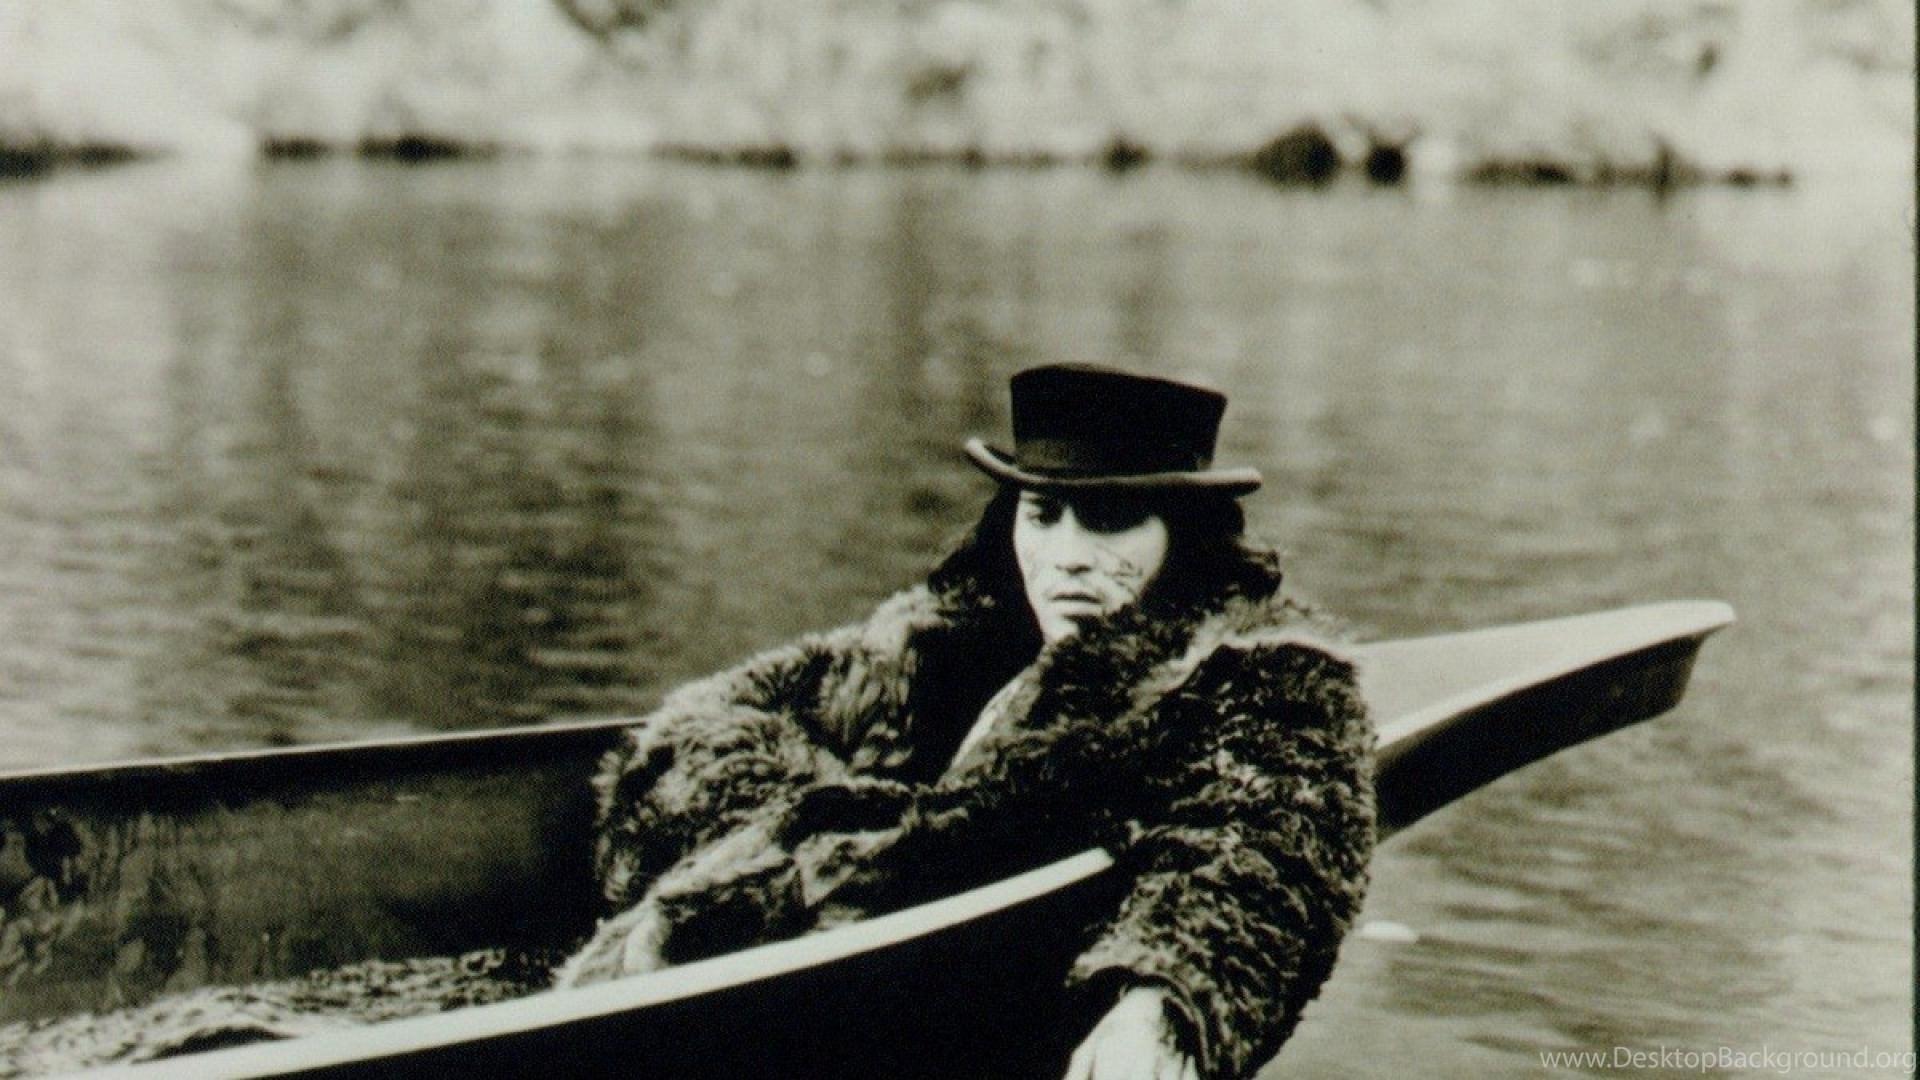 Johnny Depp Rivers Hats Dead Man (movie) Wallpapers